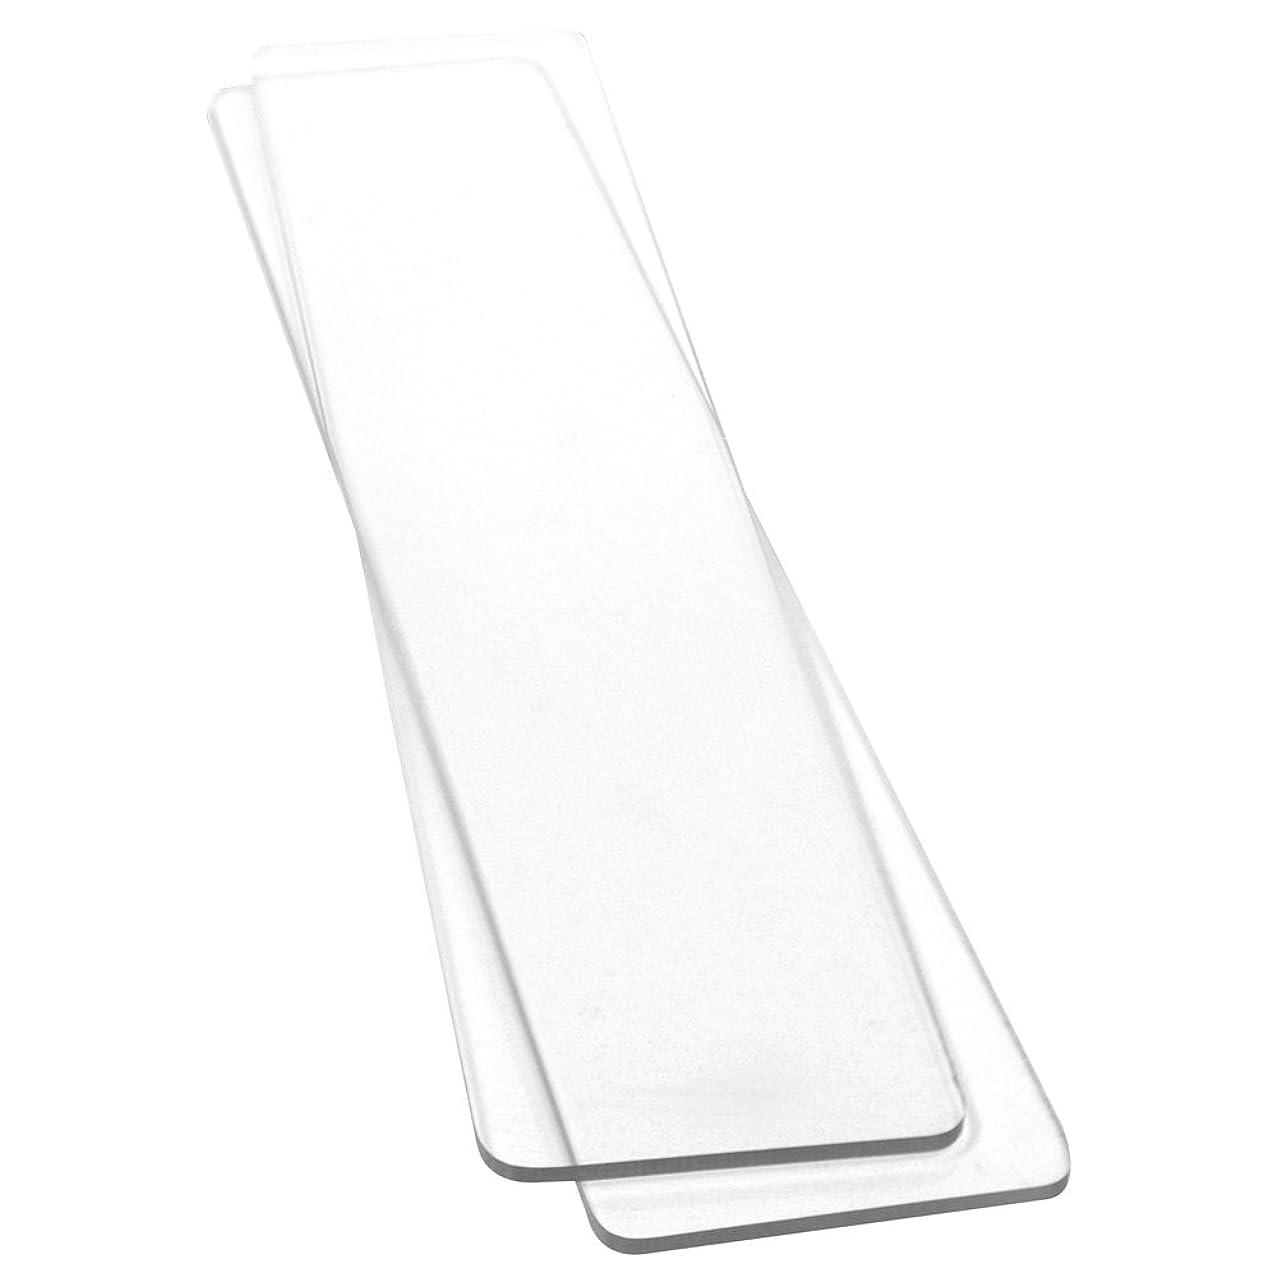 RAYHER 7906100?Sizzix Sidekick Accessory Box 1?Set of 2, Clear, Worktop Protector Chopping Board 37.5?x 7?x 0.70007?cm